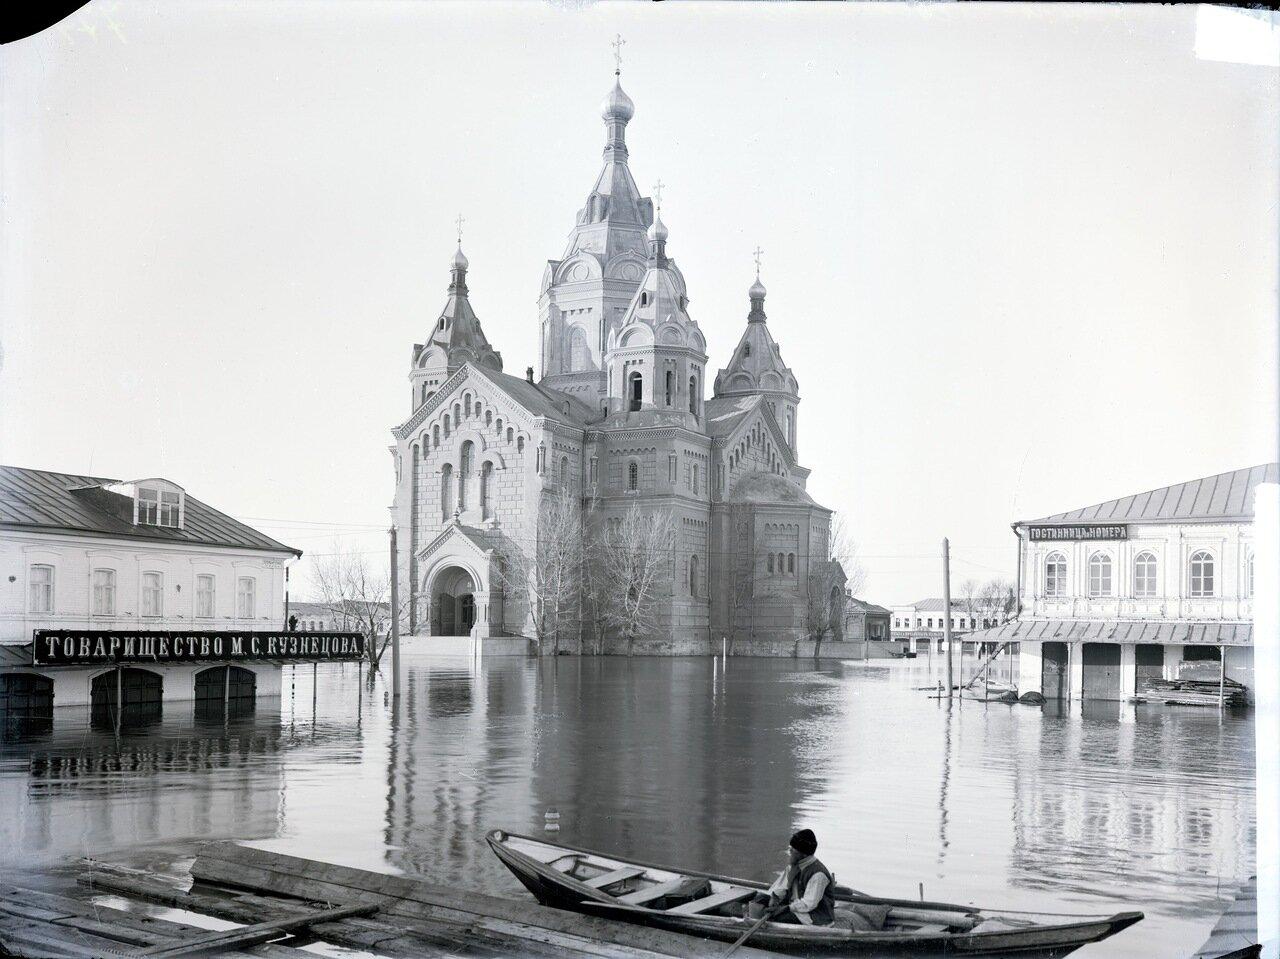 Общий вид Александро-Невского собора в половодье.  г. Нижний Новгород.1899 г.